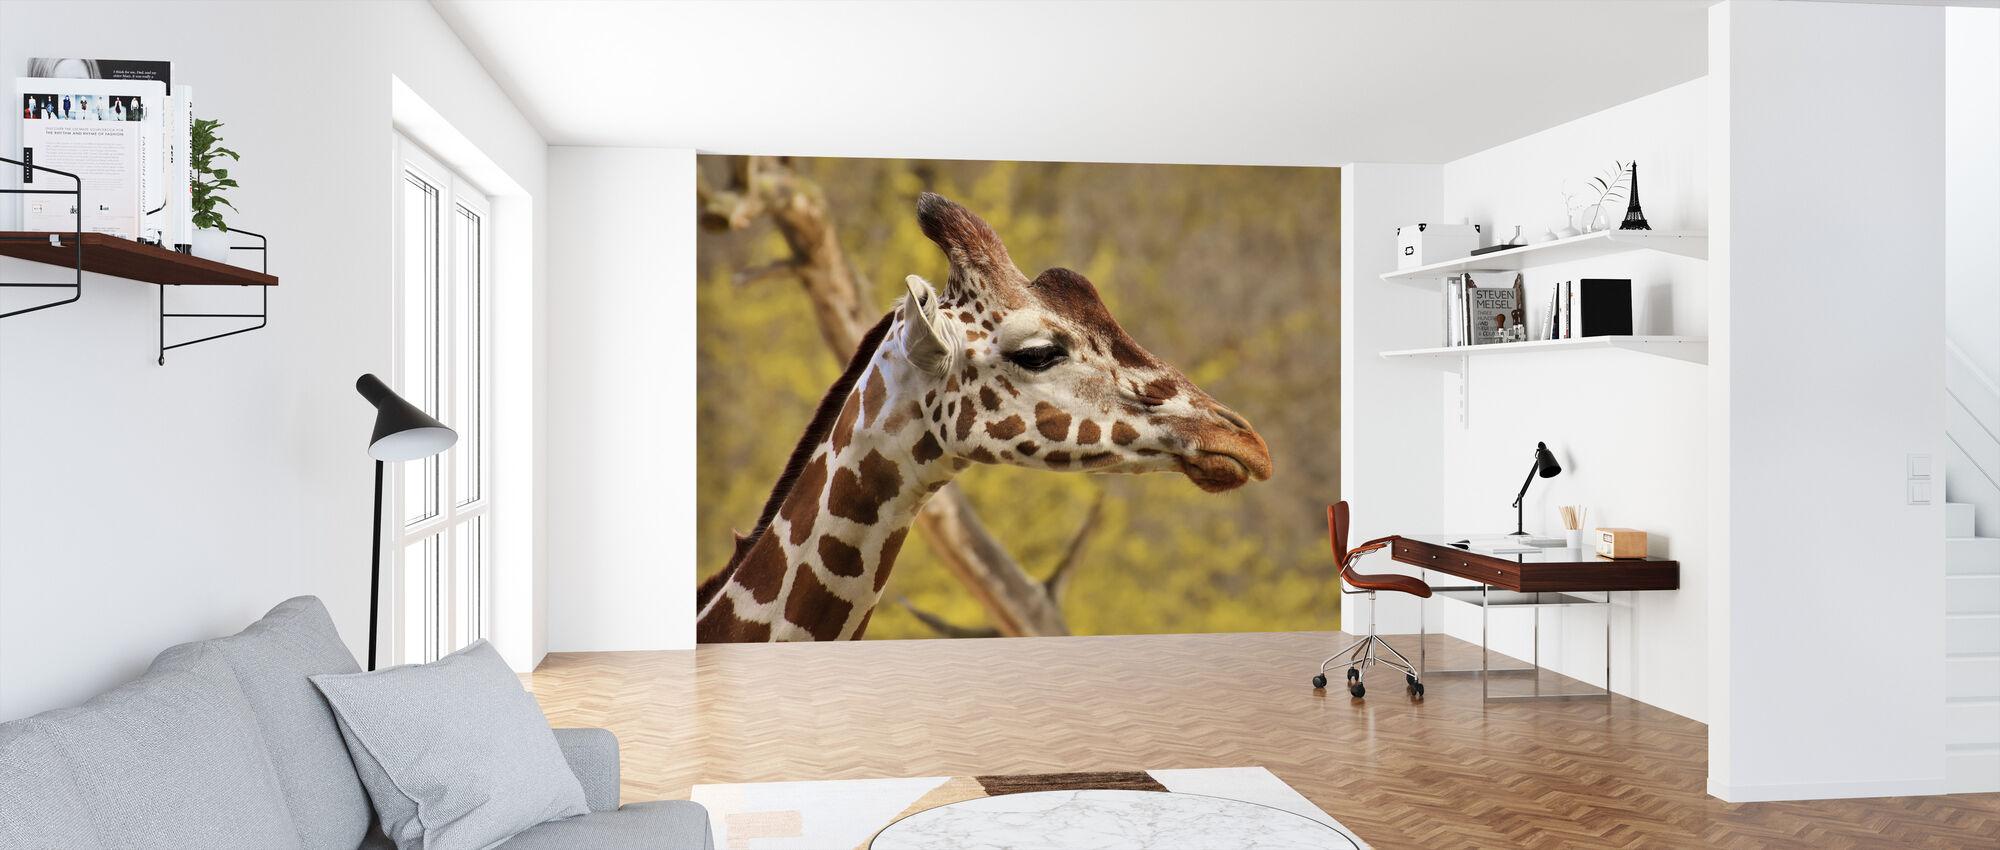 Giraffe - Wallpaper - Office